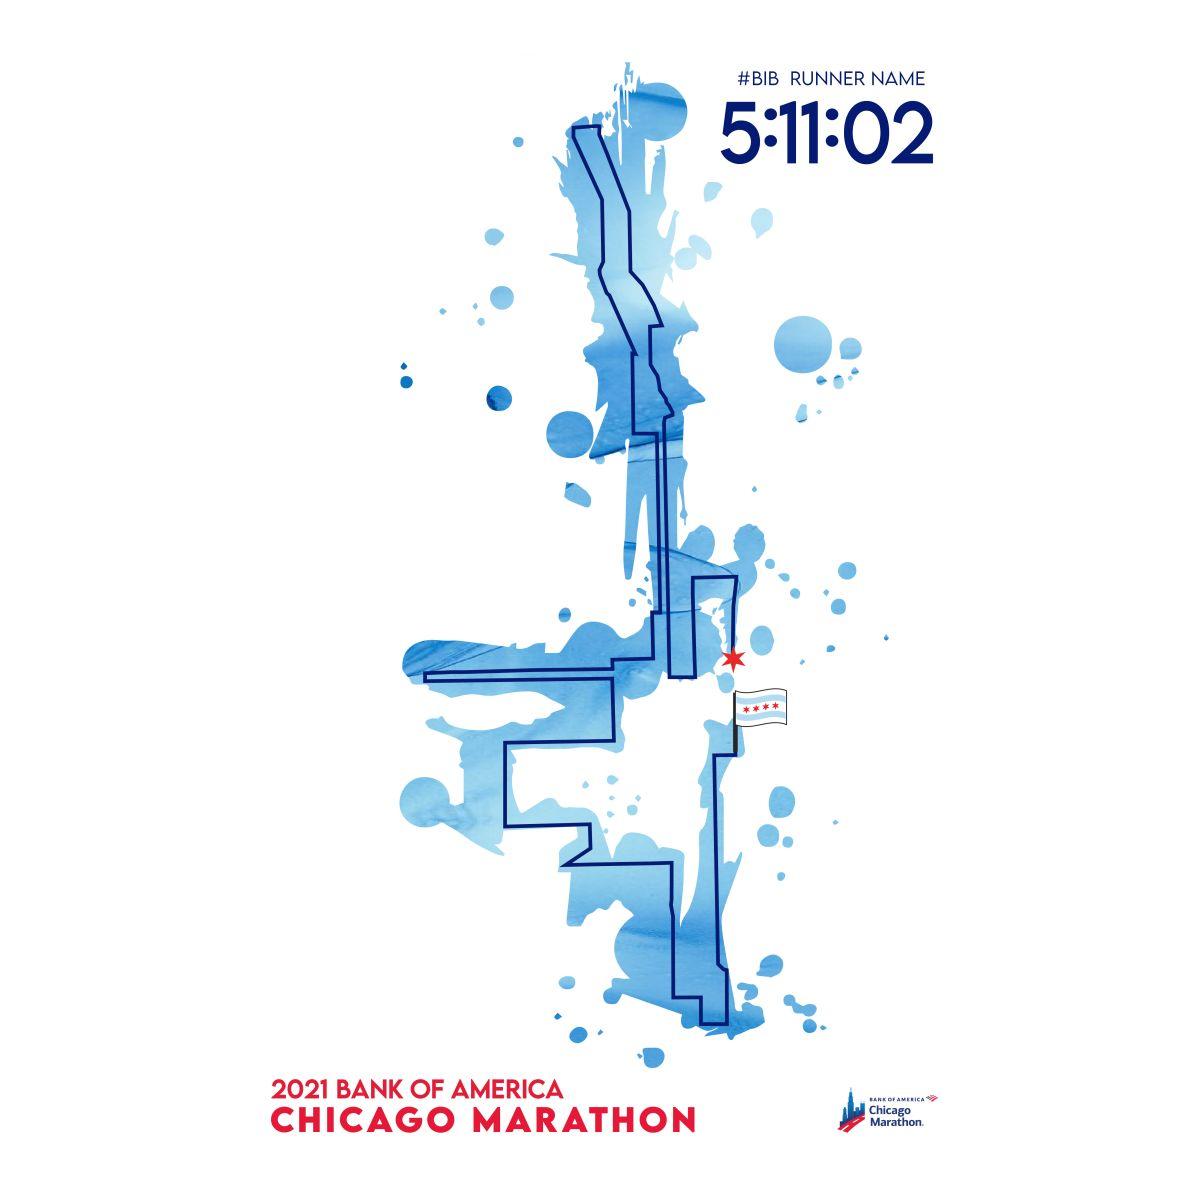 2021 Personalized Bank of America Chicago Marathon Map